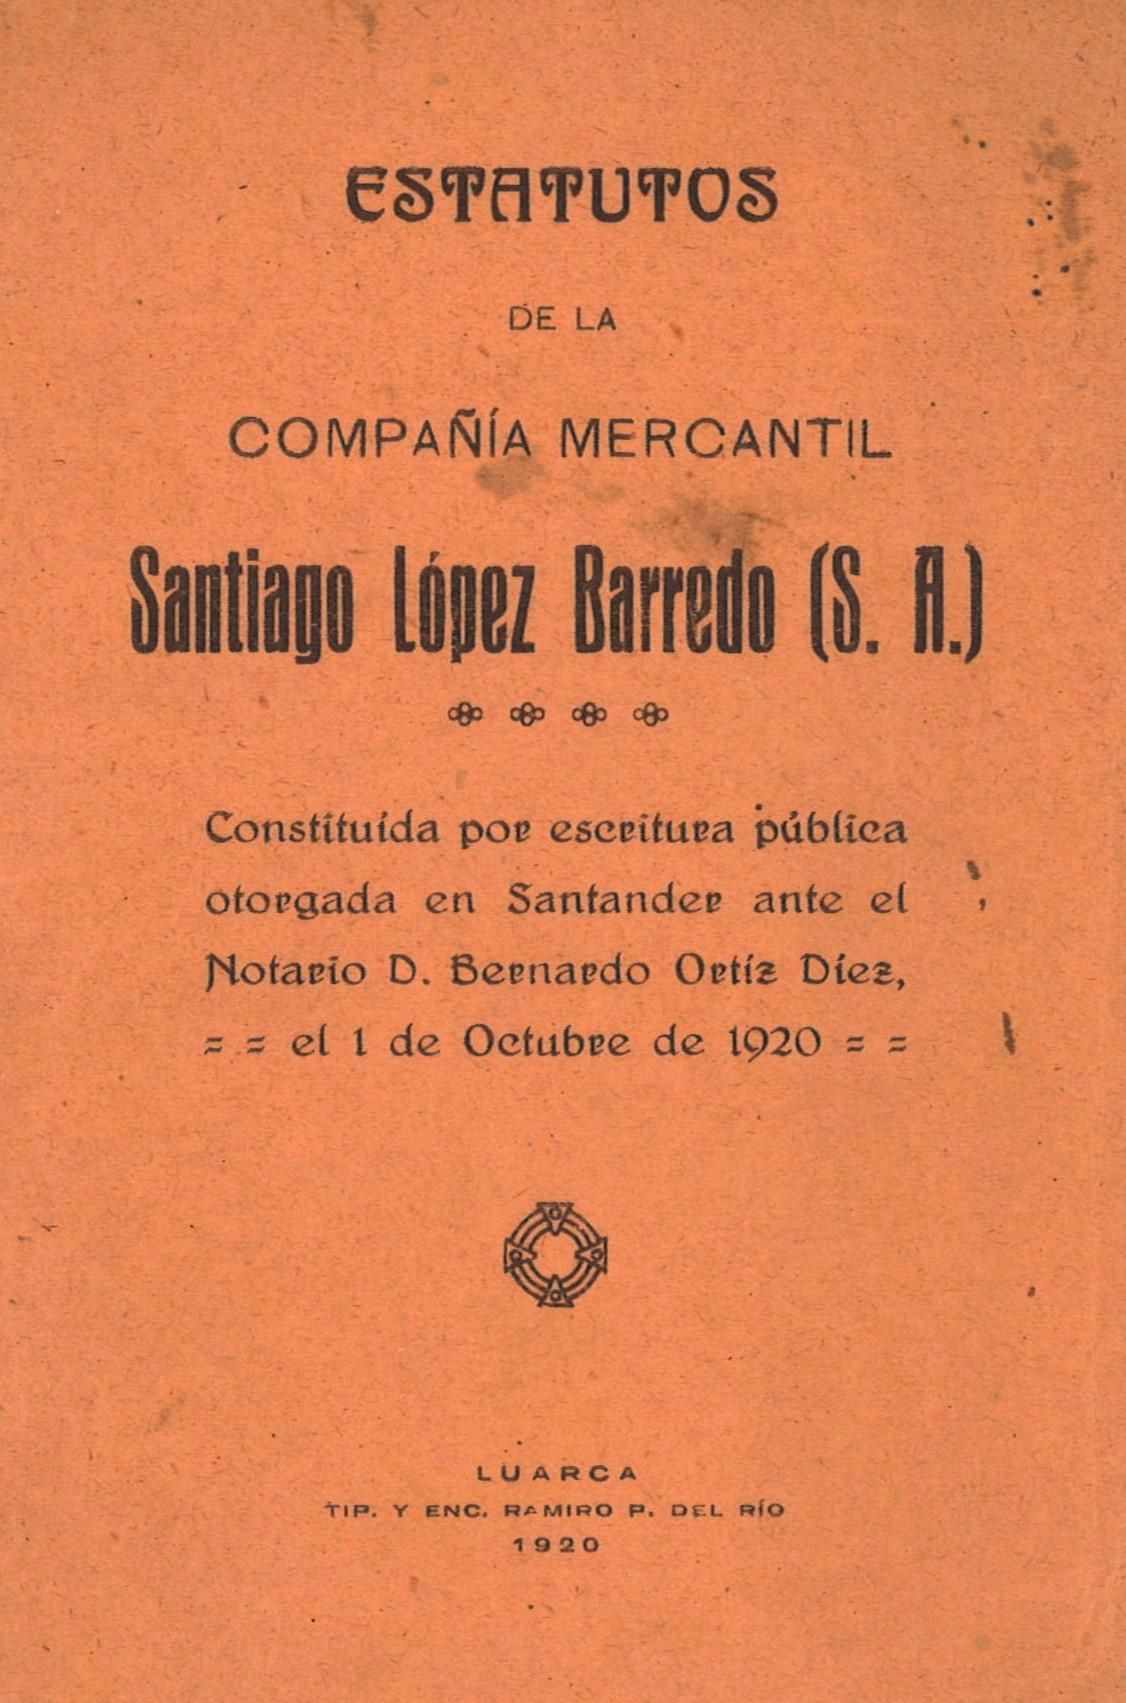 Santiago López Barredo, S.A.